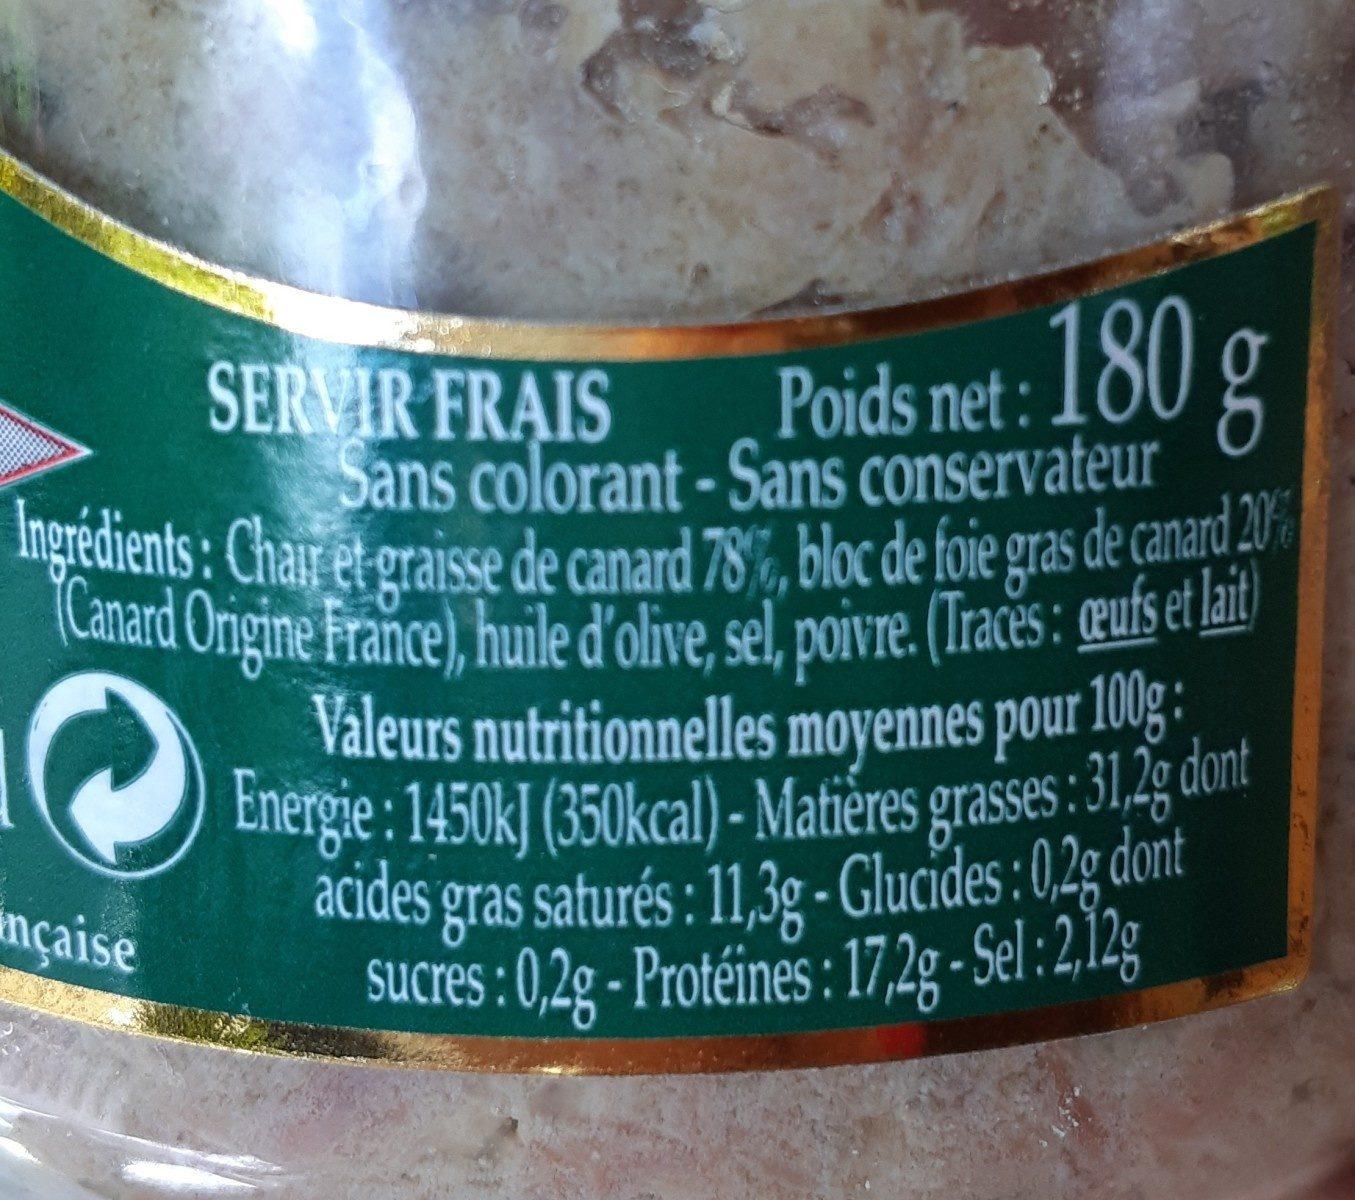 Rillettes de canard au bloc de foie gras - Ingrediënten - fr